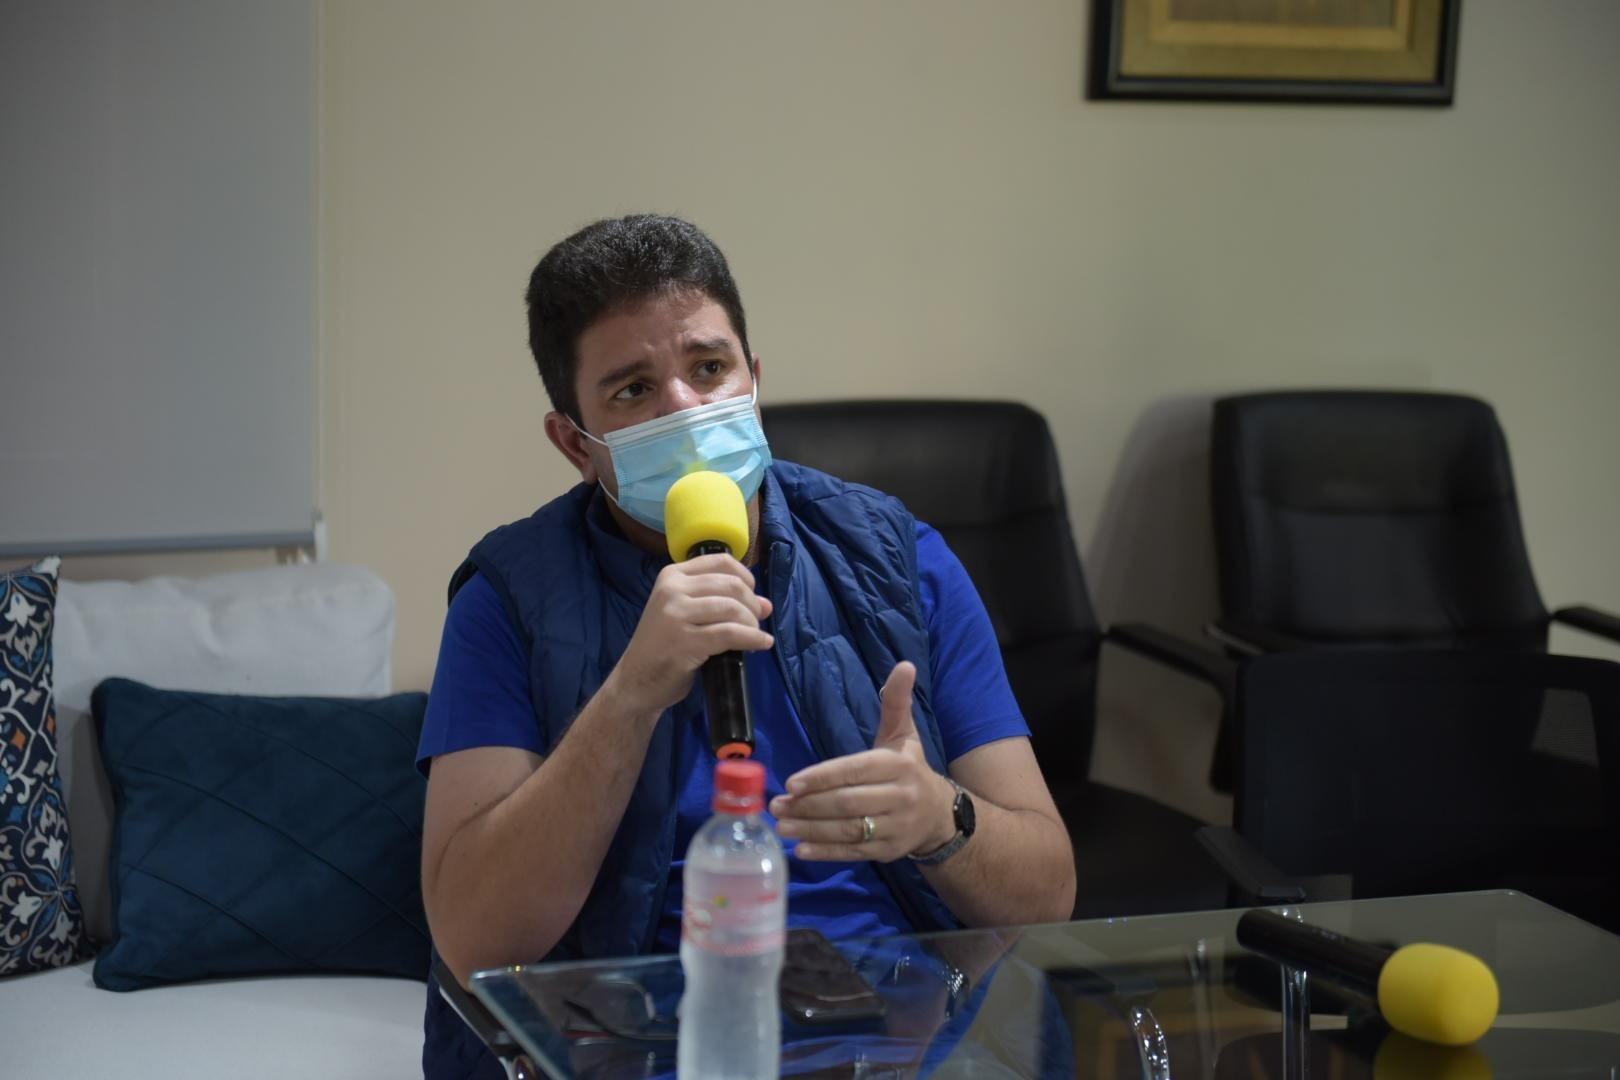 Governador solicita ao vice-presidente da República apoio no combate a desmatamentos e queimadas no Acre